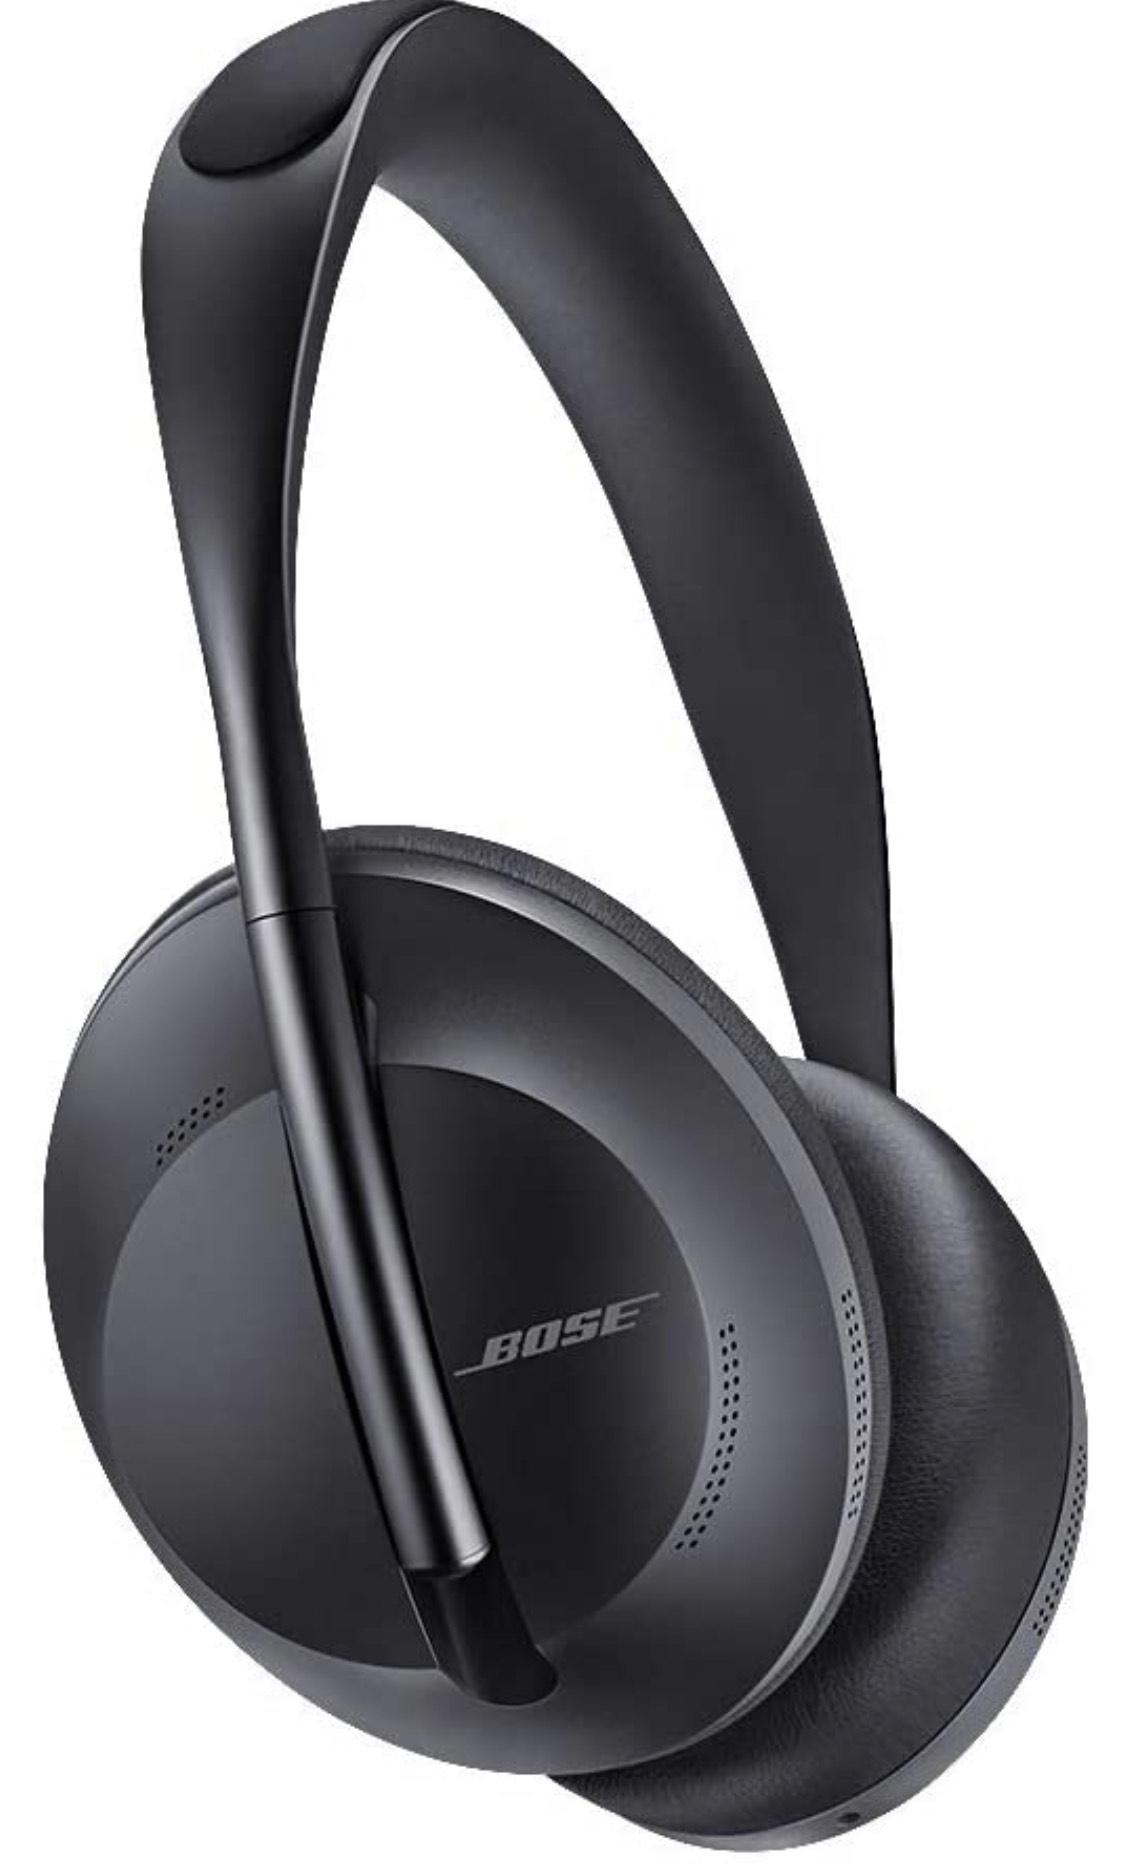 Bose Headphones 700 Noise Cancelling Wireless Bluetooth Headphones (black) inc. 2yr warranty - £229 @ Amazon